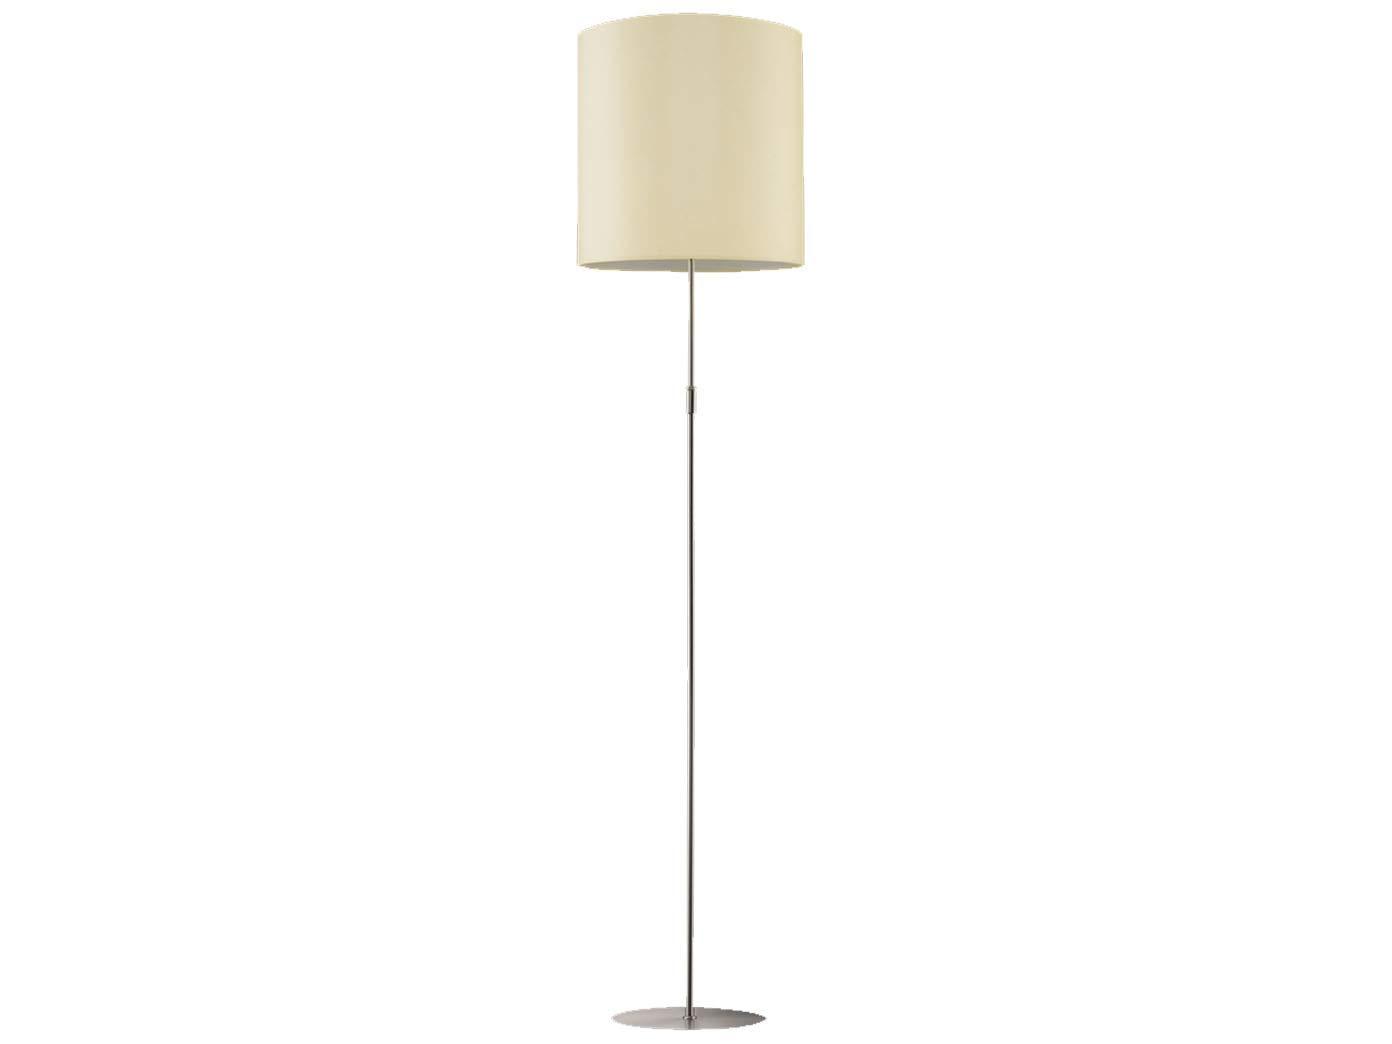 Altura ajustable - Lámpara de pie en níquel mate, pantalla de ...